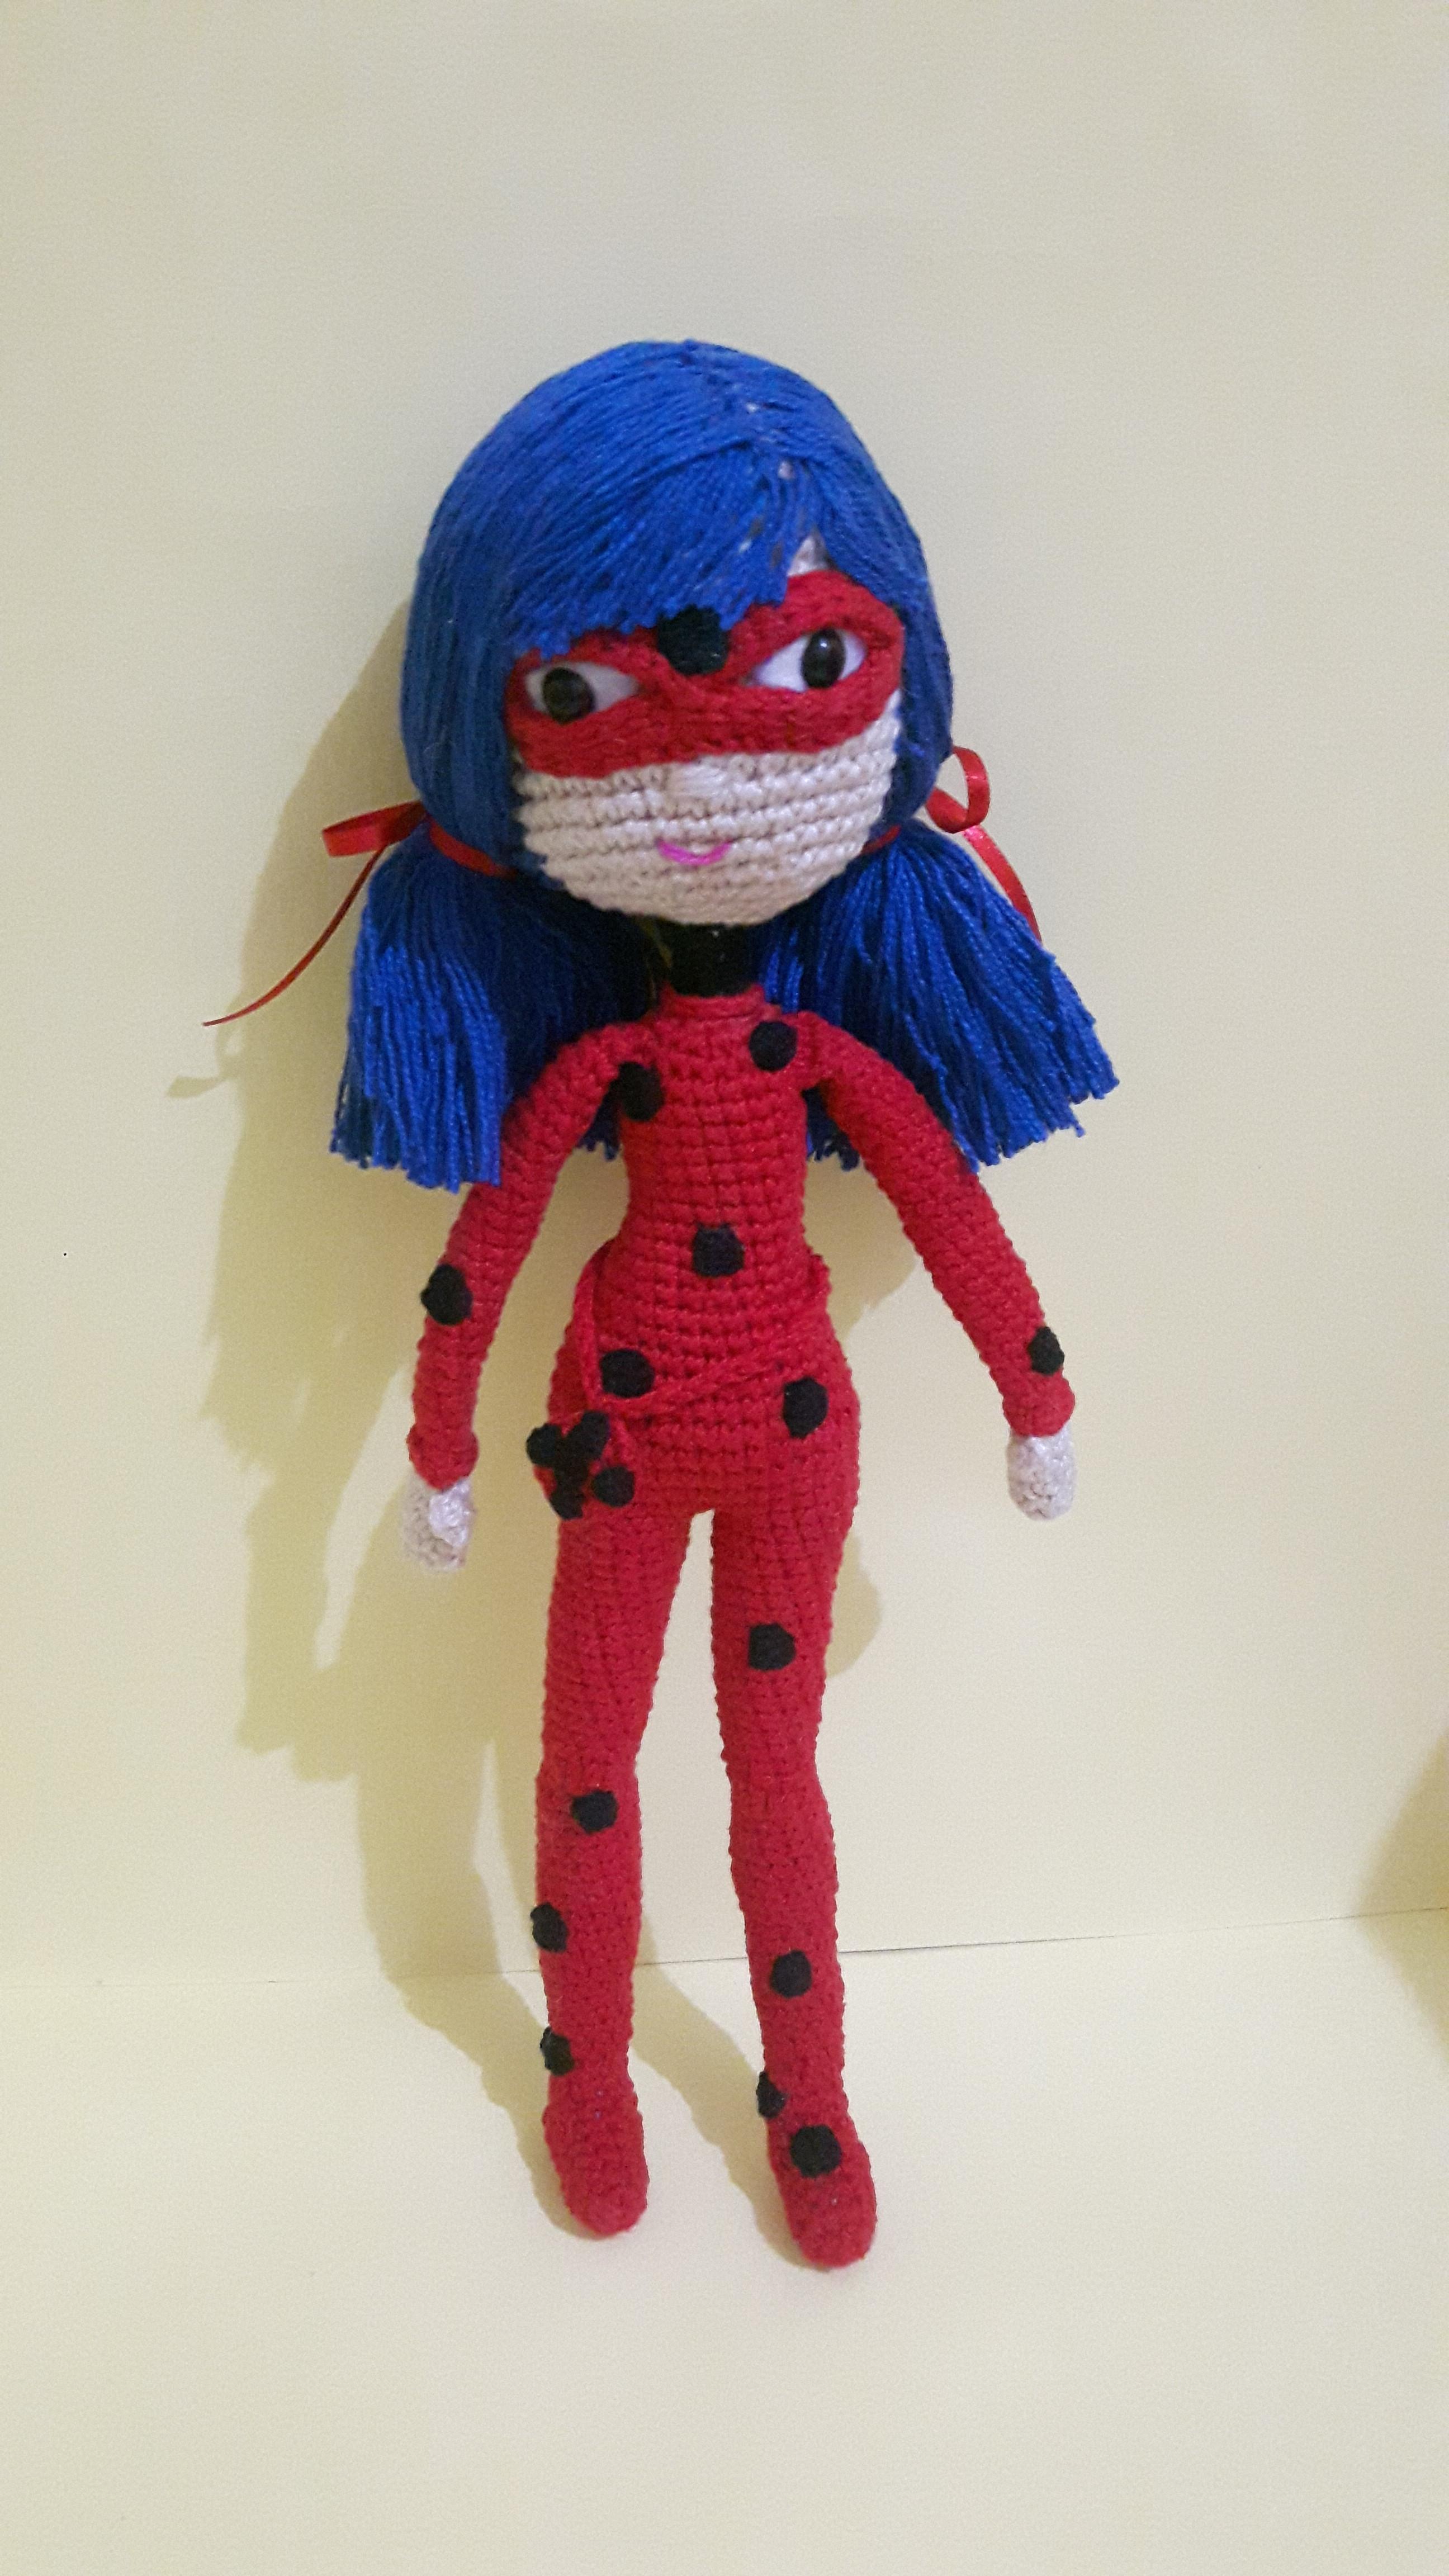 Miraculous Ladybug Crochet Doll Part 1 - YouTube | 4608x2592